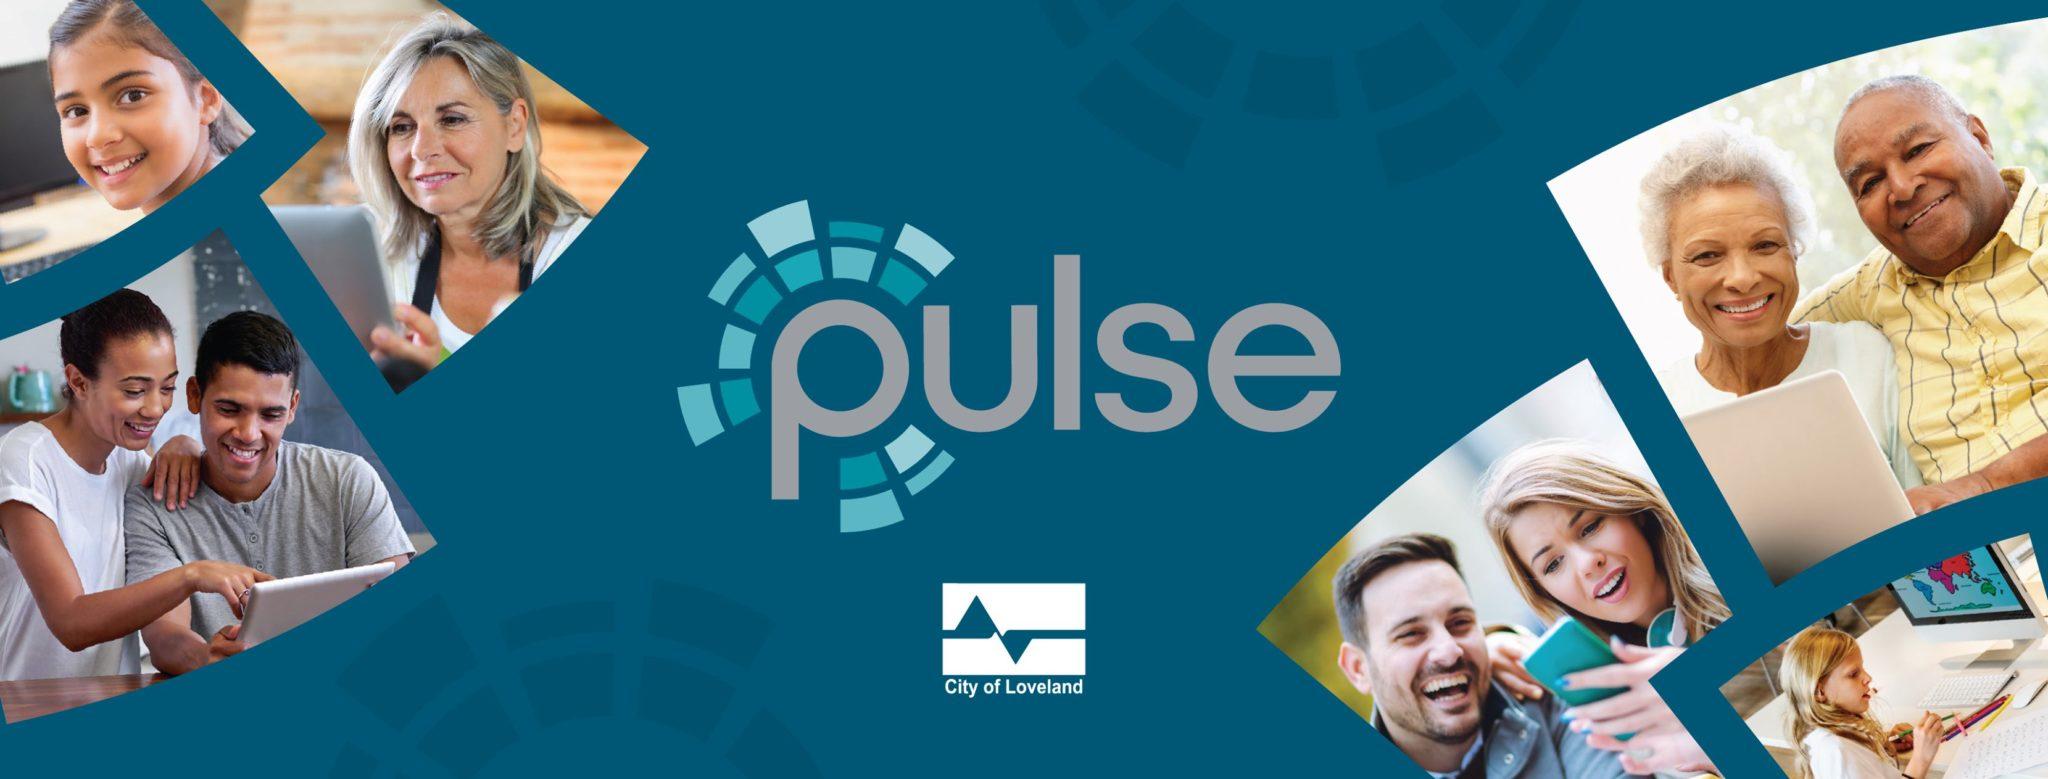 Loveland Pulse: Local Fiber-Optic Network